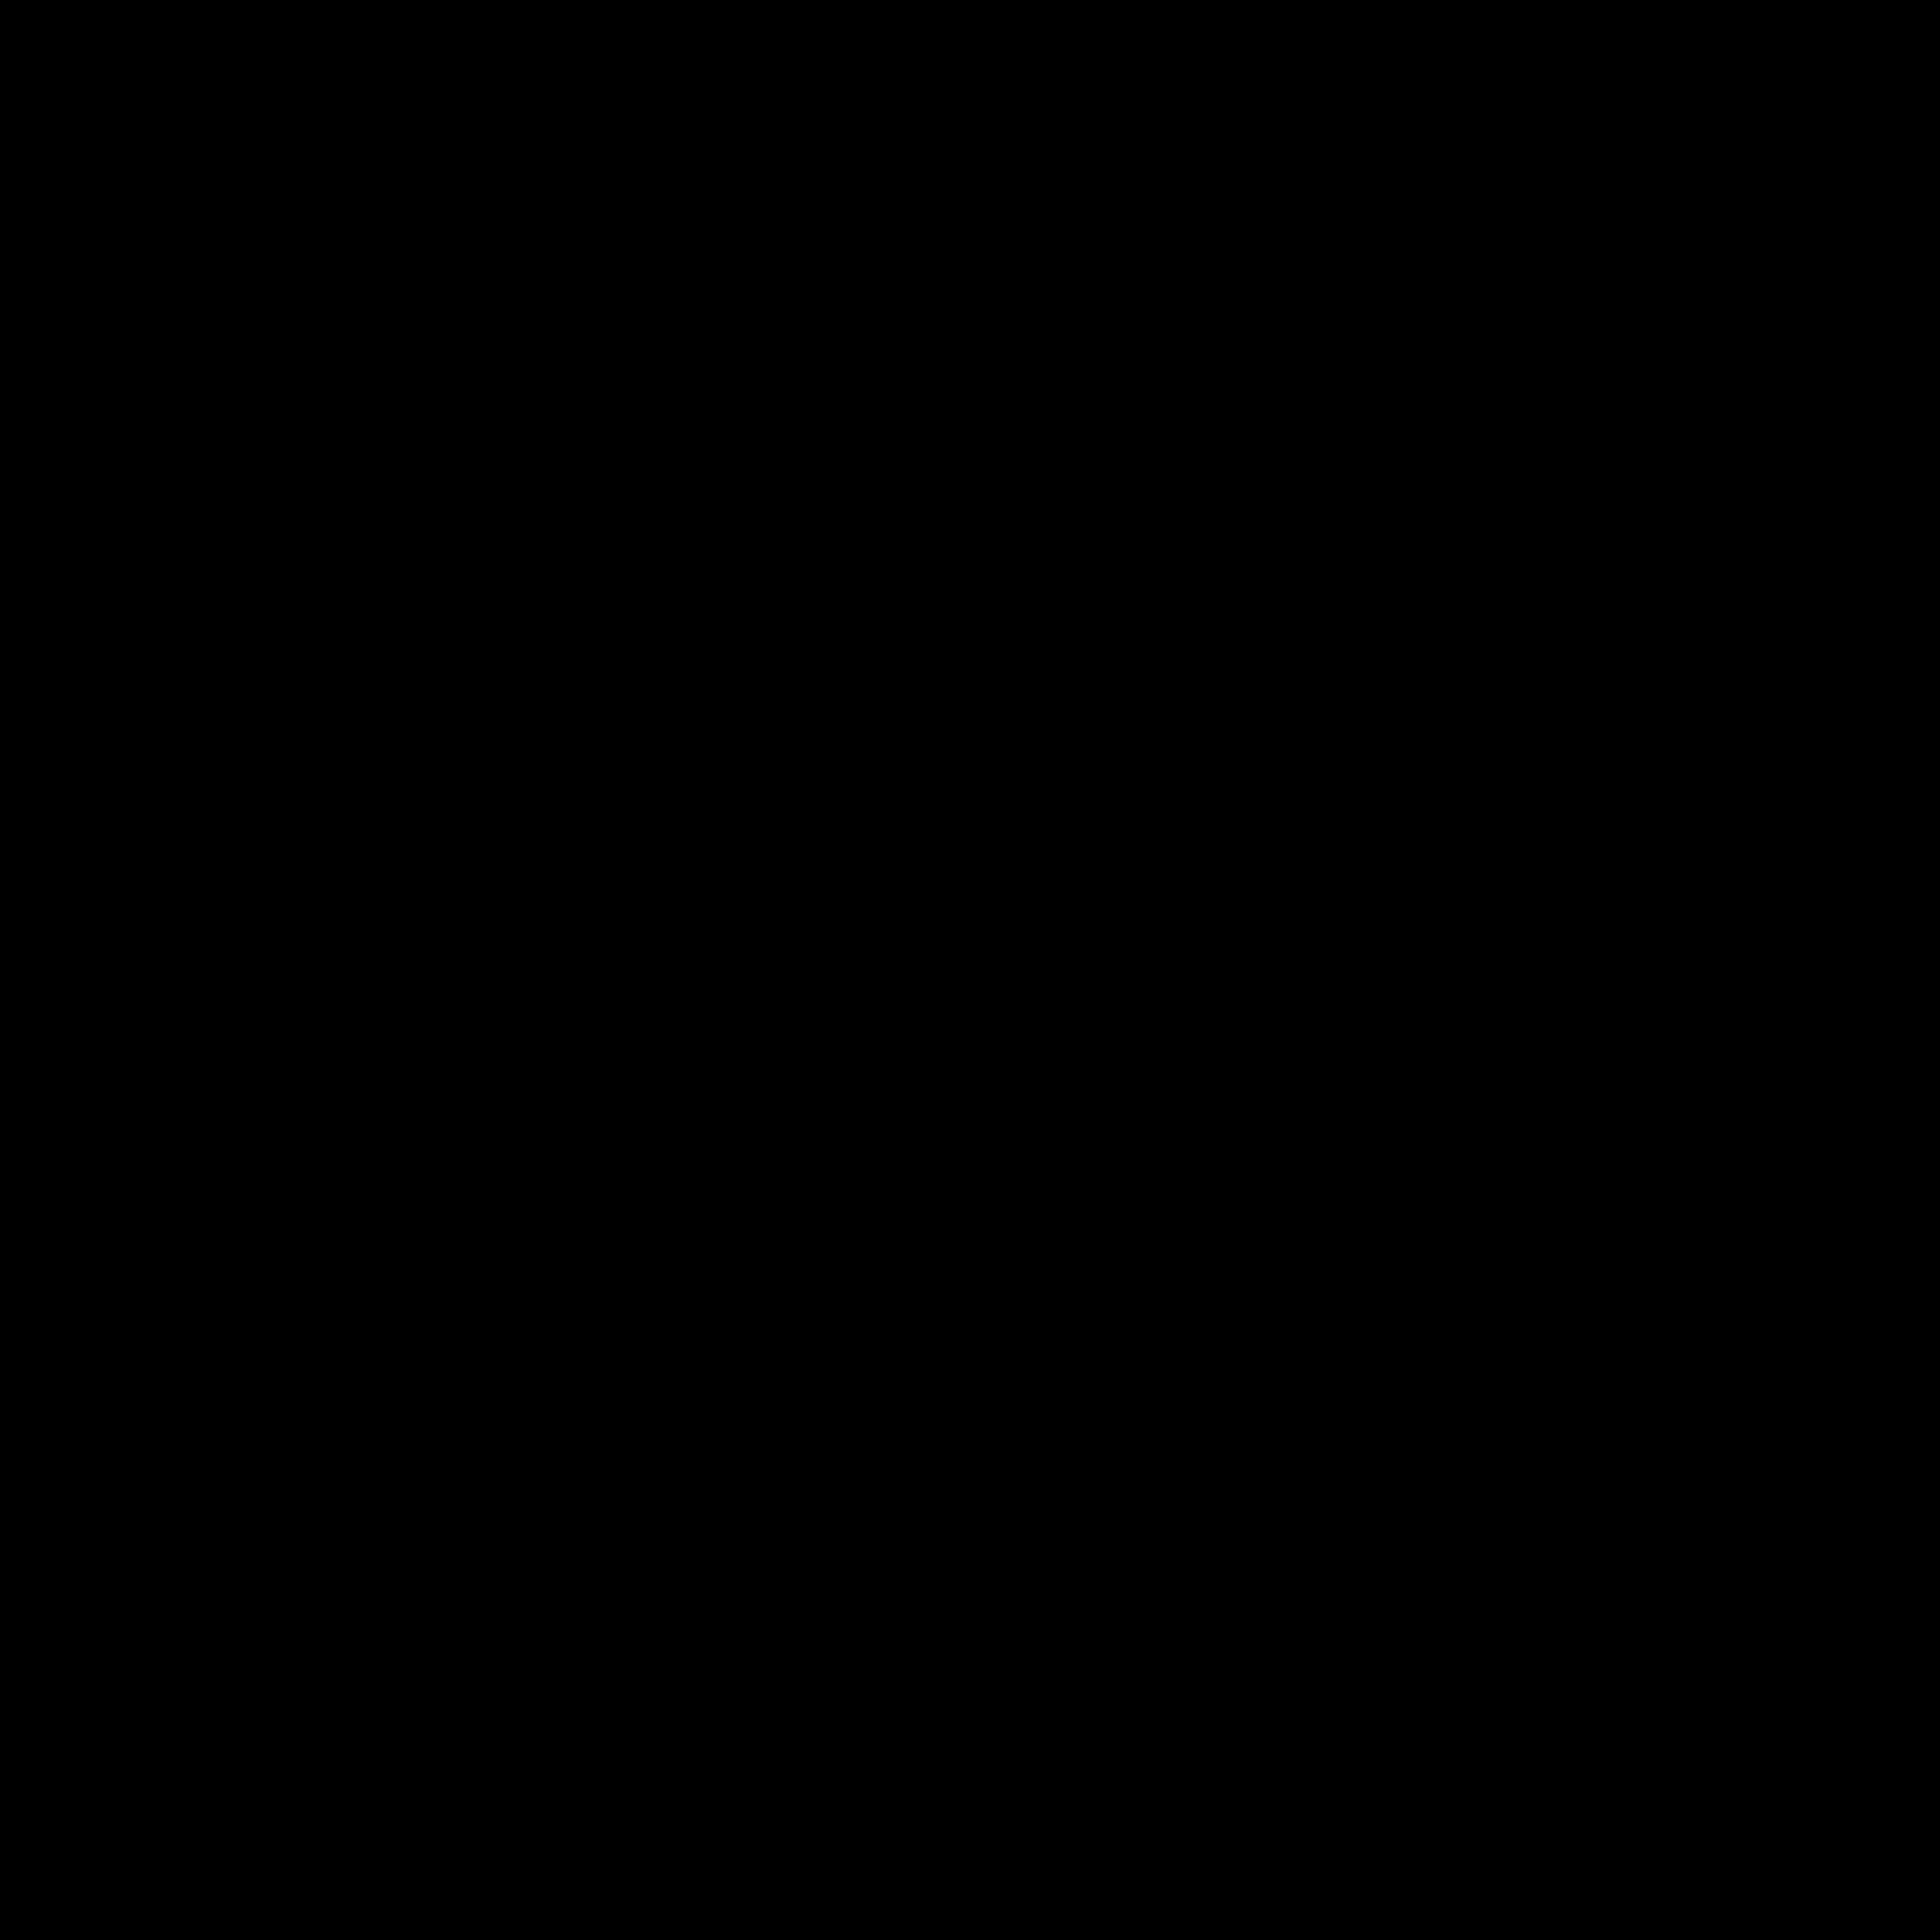 Calvin Klein Logo Png Transparent & Svg Vector - Pluspng Pluspng.com - Calvin Klein Logo PNG